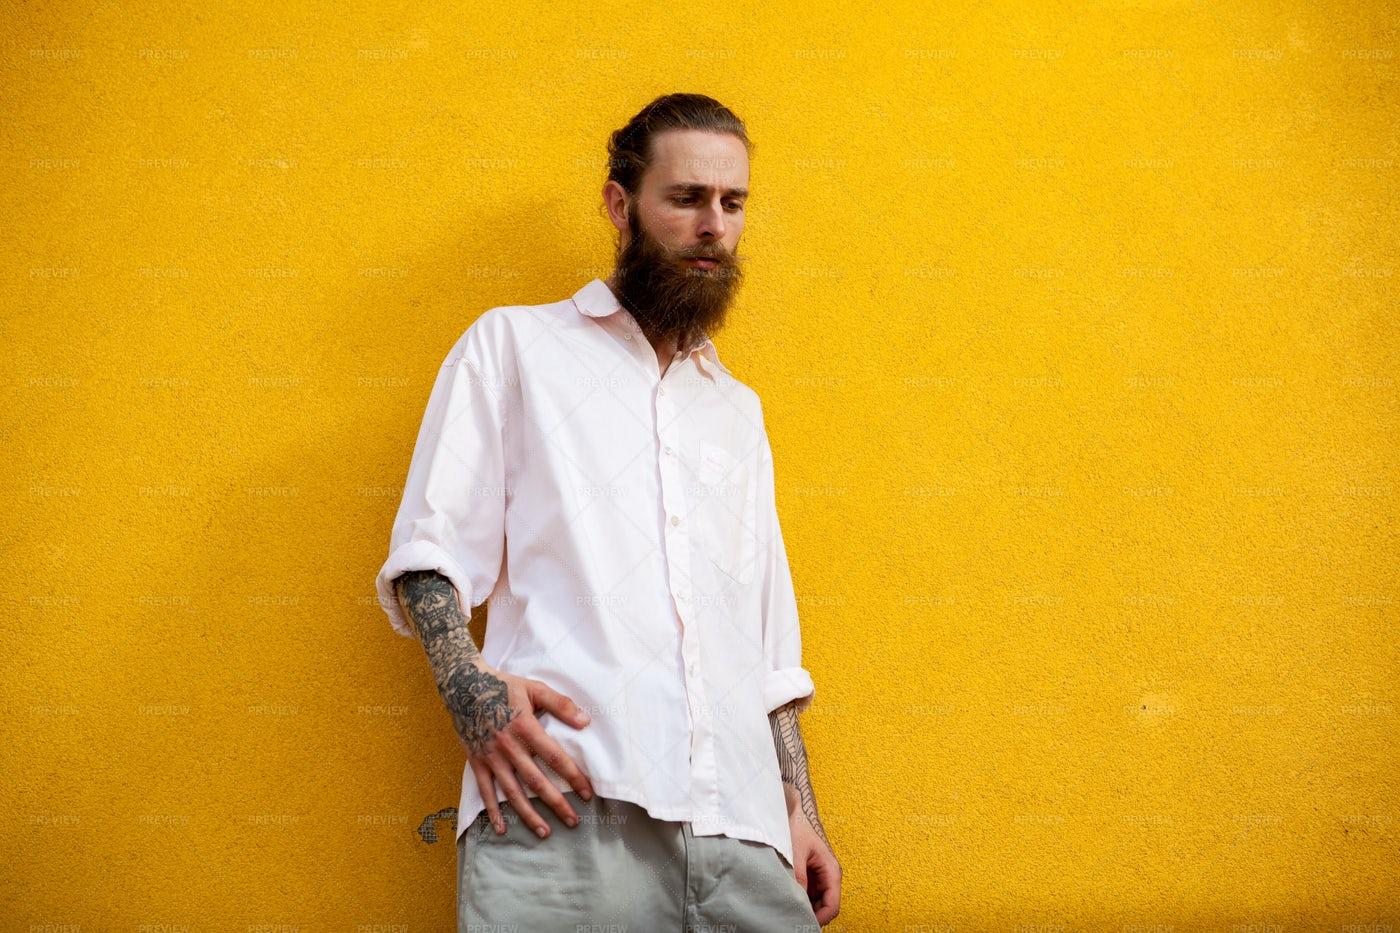 Hipster Man On Yellow: Stock Photos